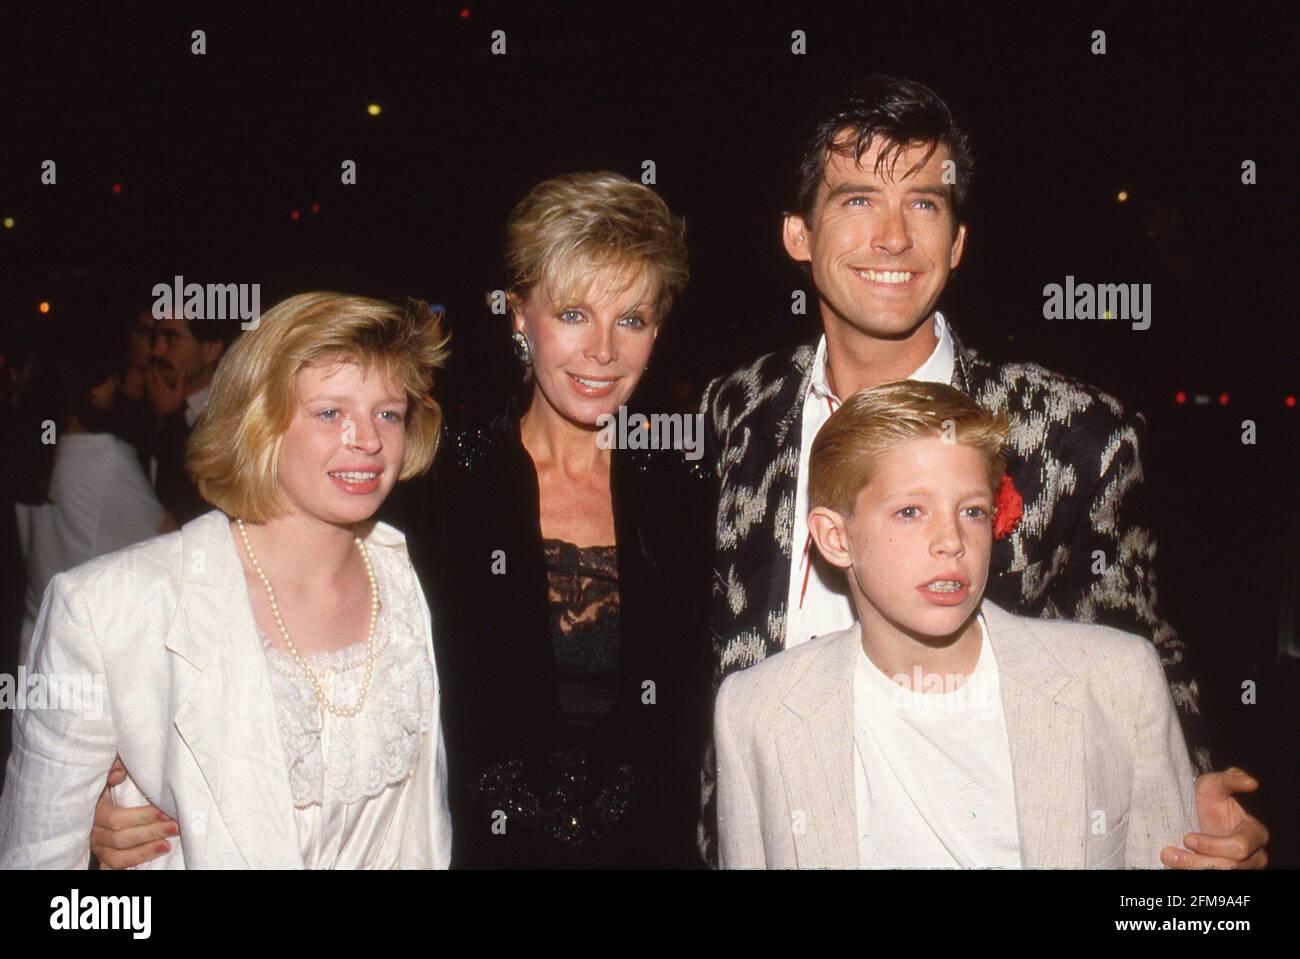 Pierce Brosnan avec Chris Brosnan, Cassandra Harris et Charlotte Brosnan Circa 1986 crédit: Ralph Dominguez/MediaPunch Banque D'Images